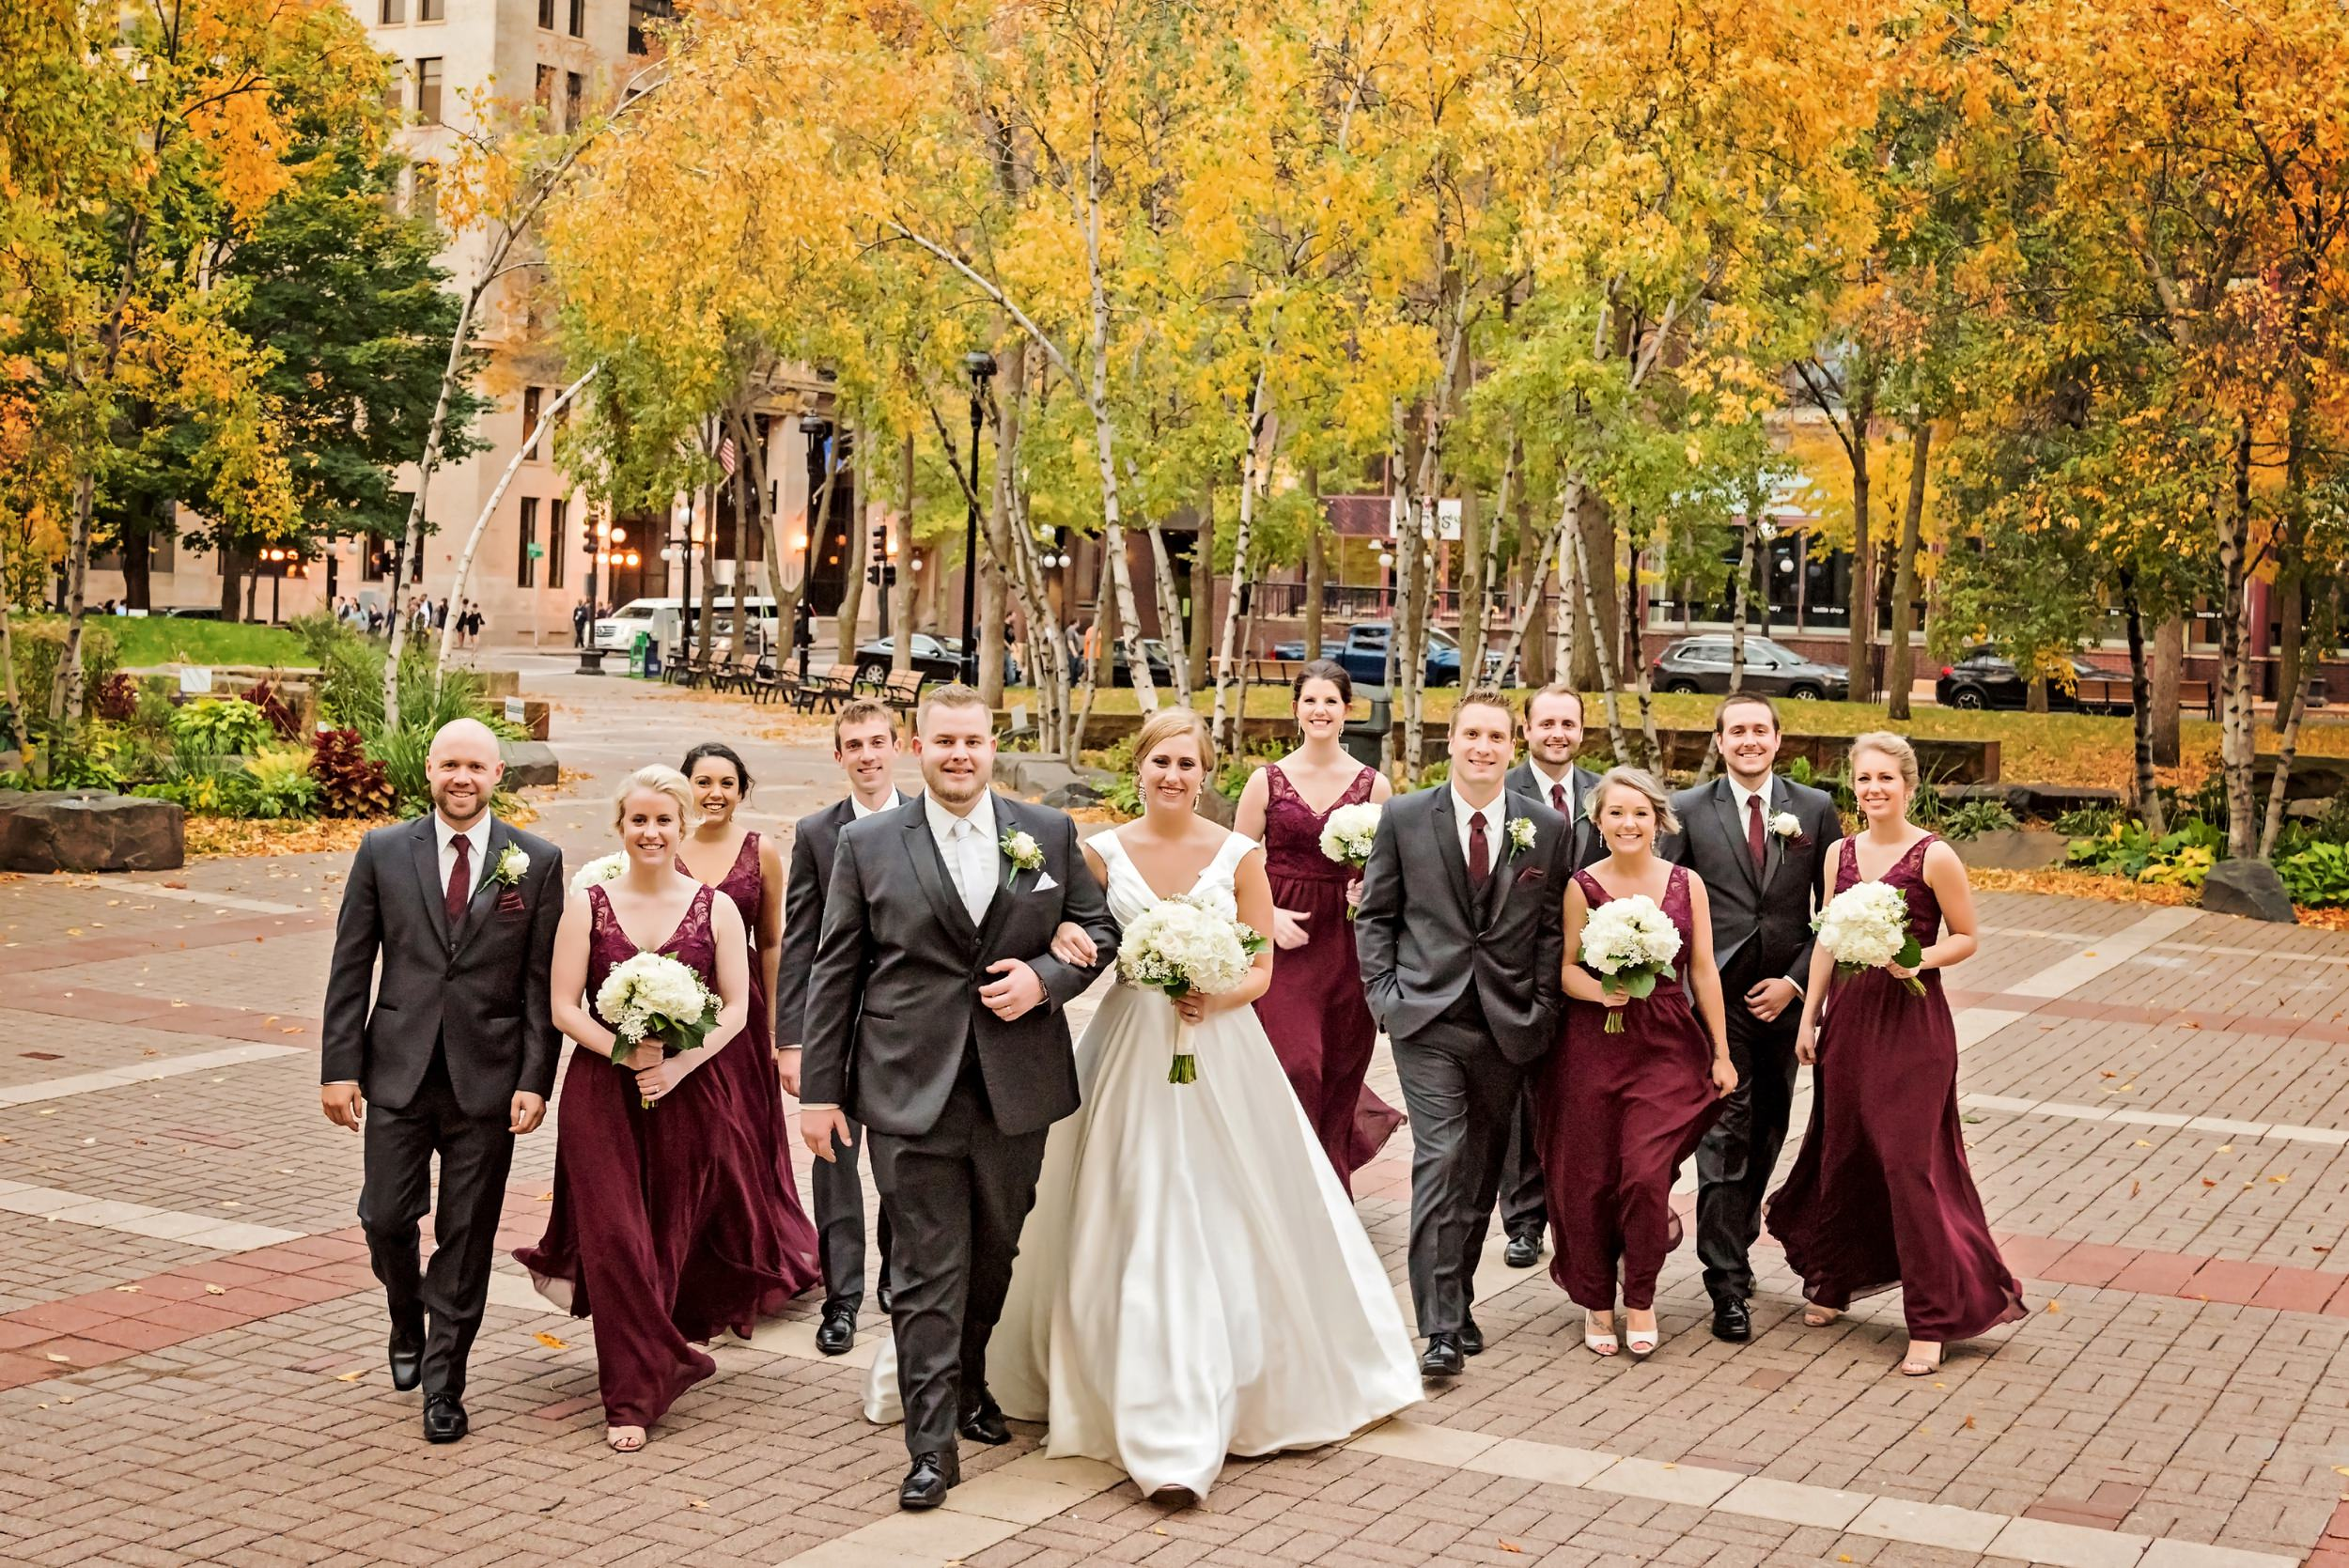 2018-Real-Wedding-Megan-Brenden-Rotella-Photography_0418.jpg